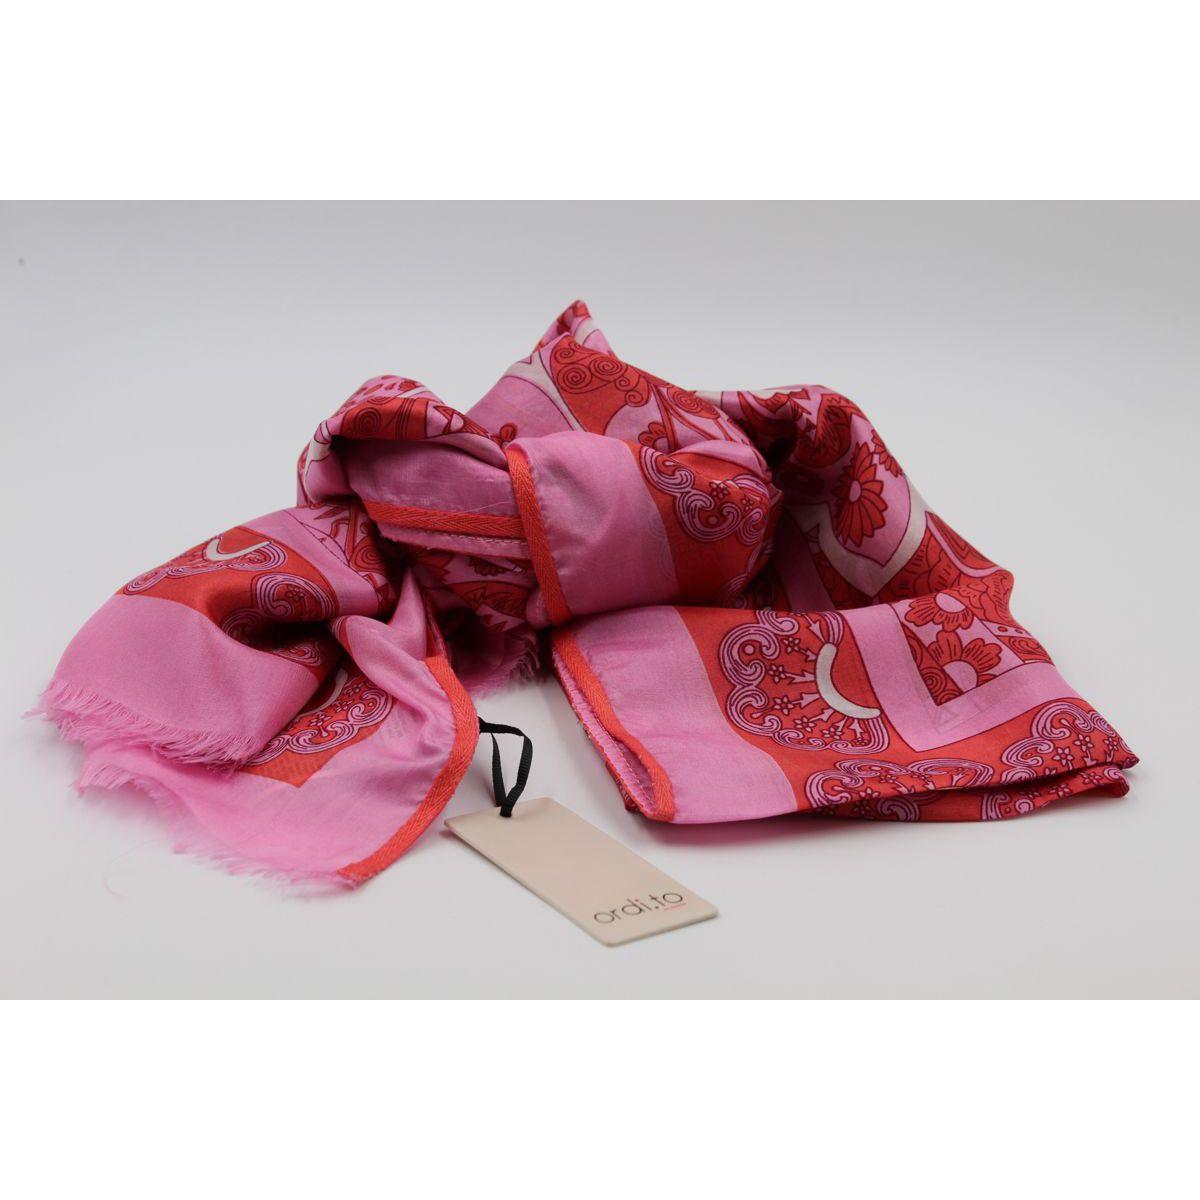 Bellini scarf Fucsia Ordi.to